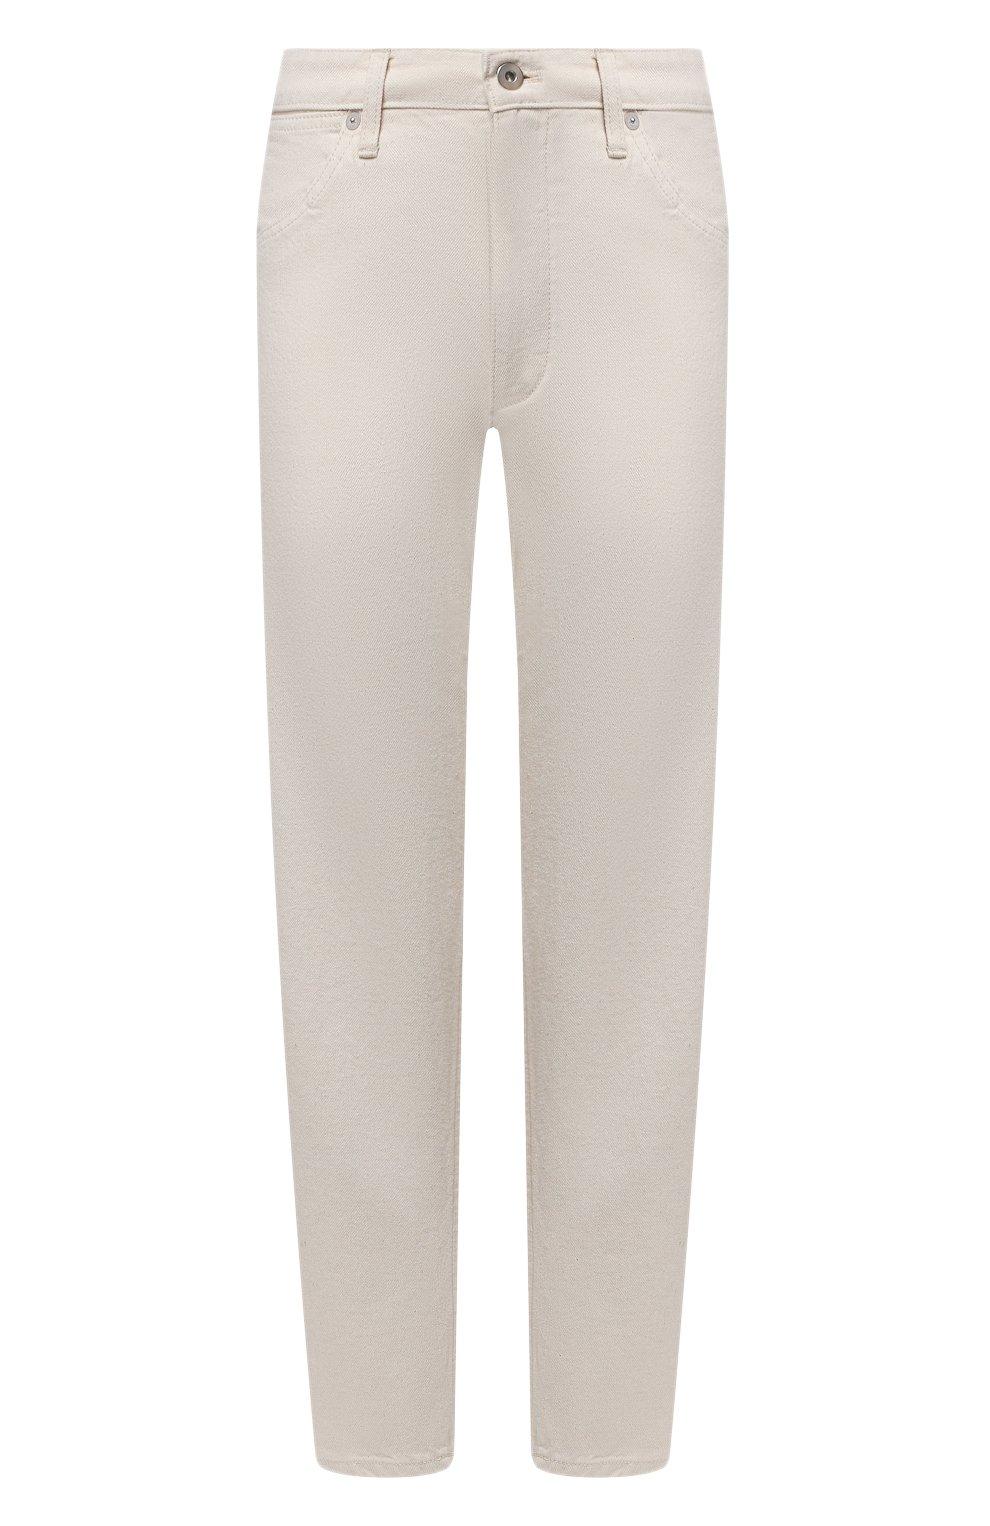 Женские джинсы JIL SANDER бежевого цвета, арт. JPPS663107-WS246500 | Фото 1